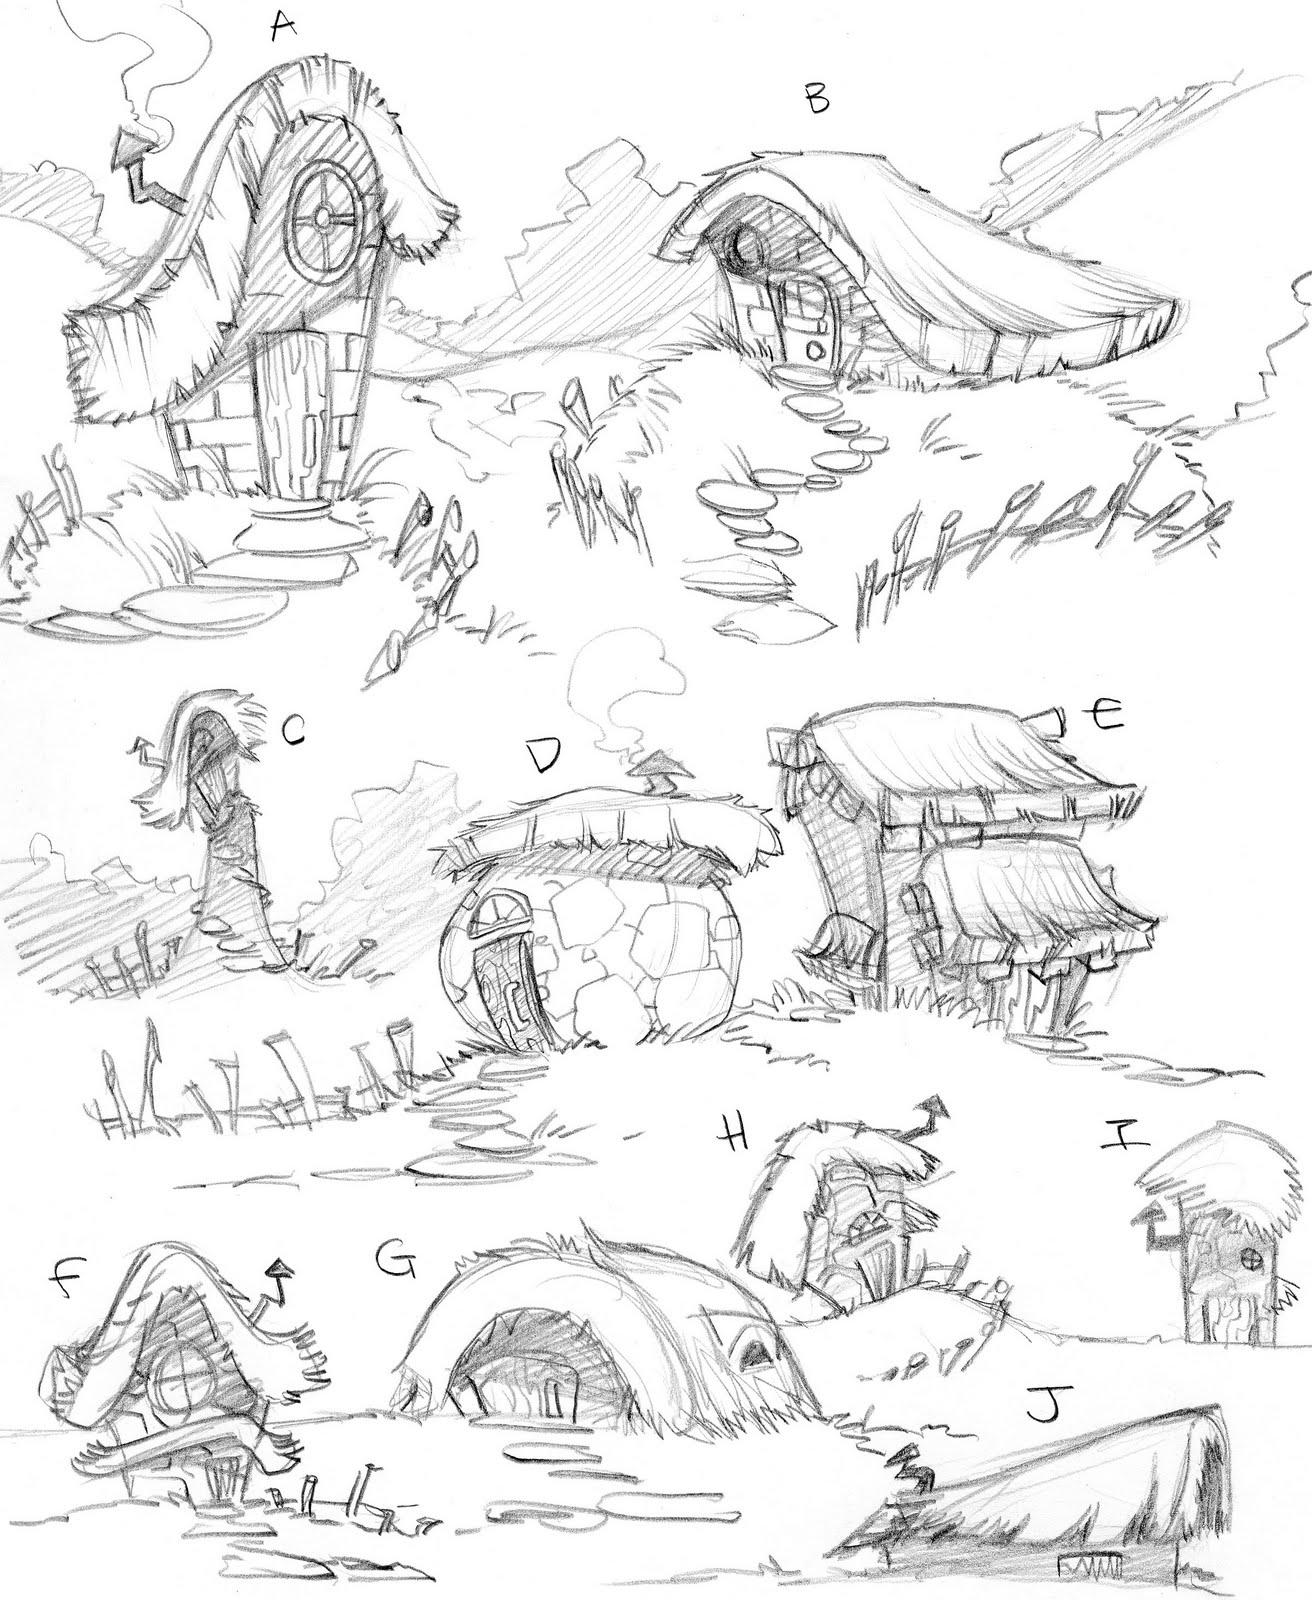 how to draw a cartoon treehouse